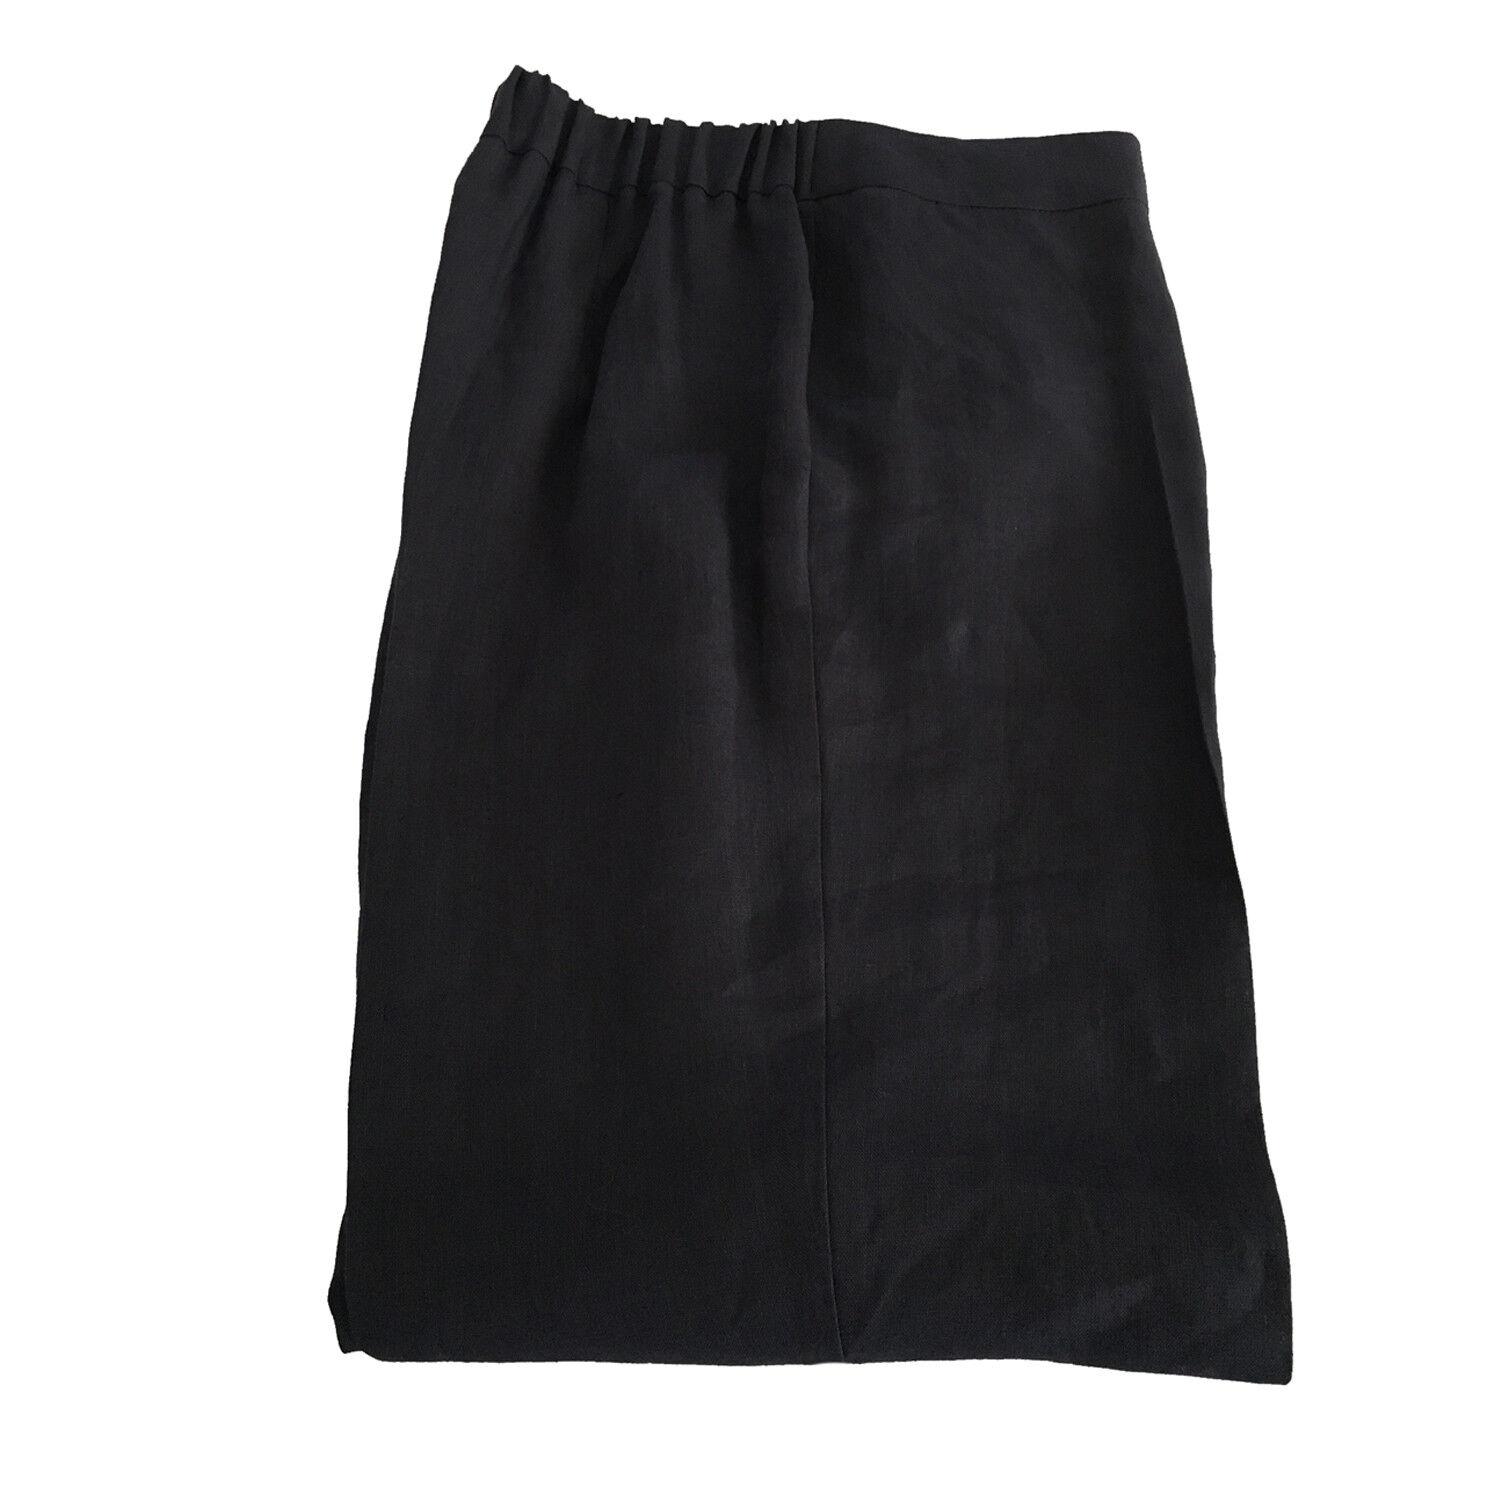 PERSONA by Marina Rinaldi women's trousers ROSSINI 100% linen bluee elastic